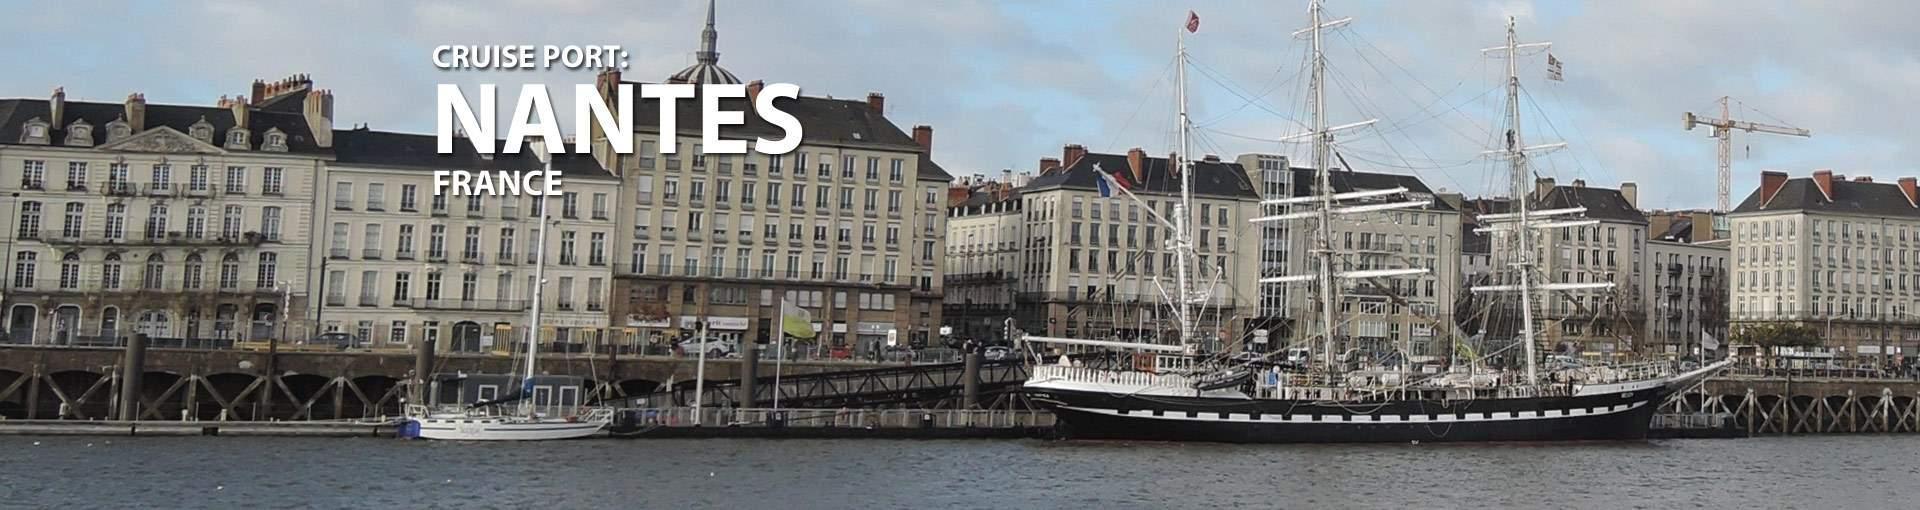 Nantes, France Cruise Port